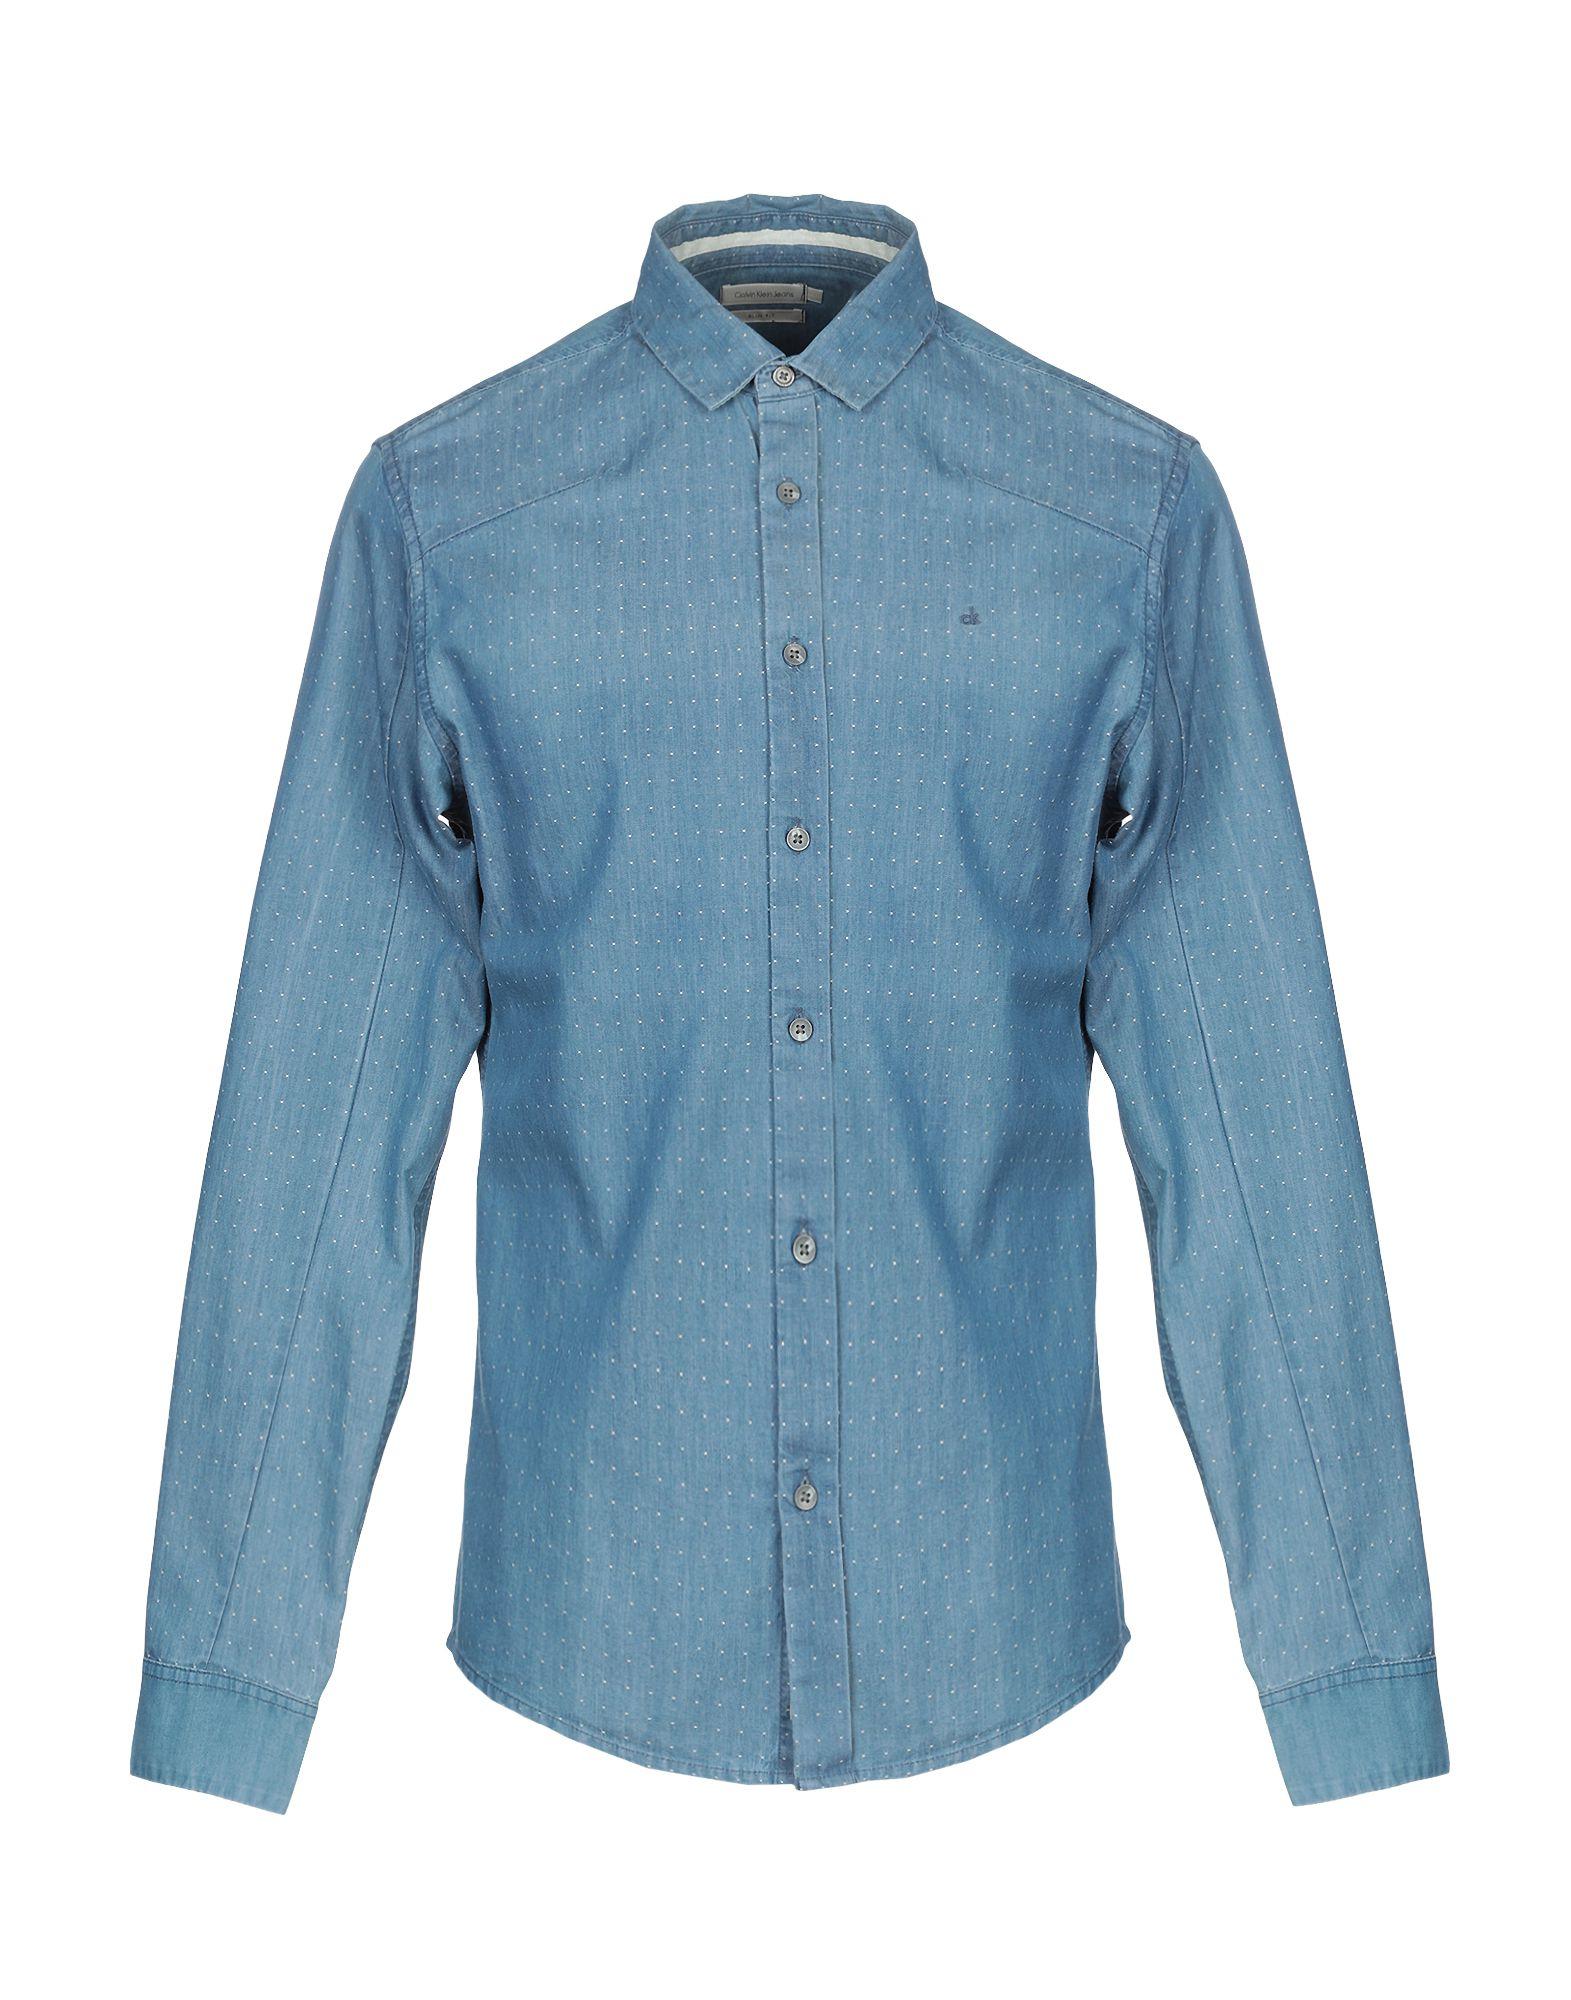 CALVIN KLEIN JEANS Джинсовая рубашка рубашка calvin klein jeans j20j2 06431 1120